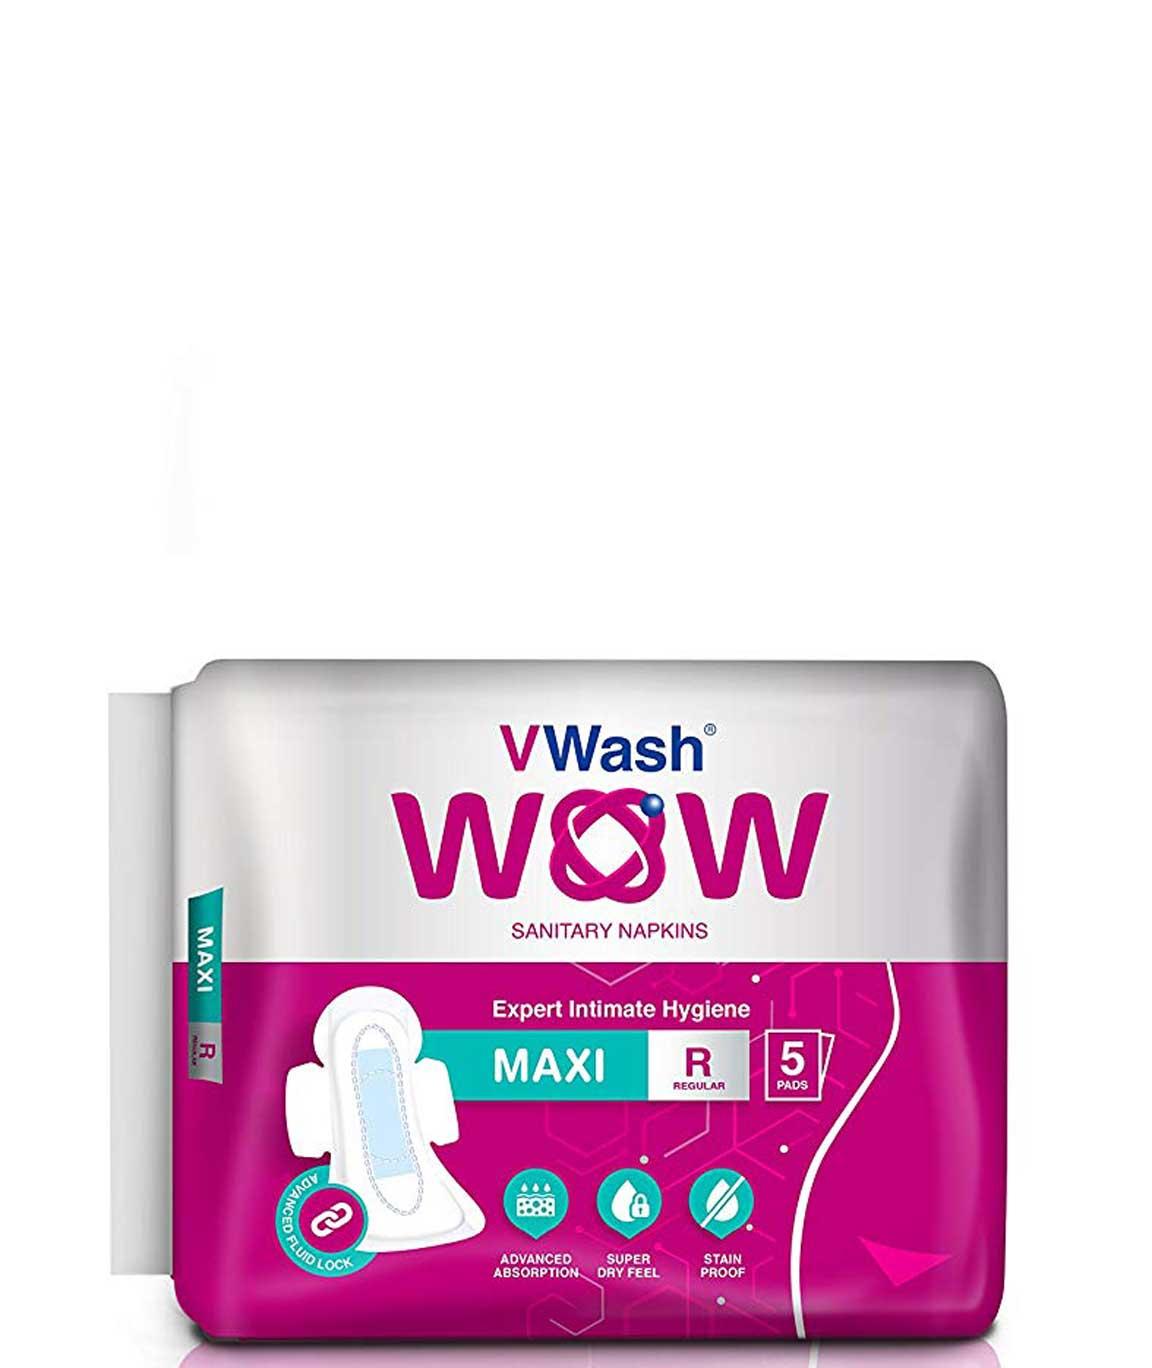 VWash Wow Sanitary Napkin Maxi - 5 Count (Regular)